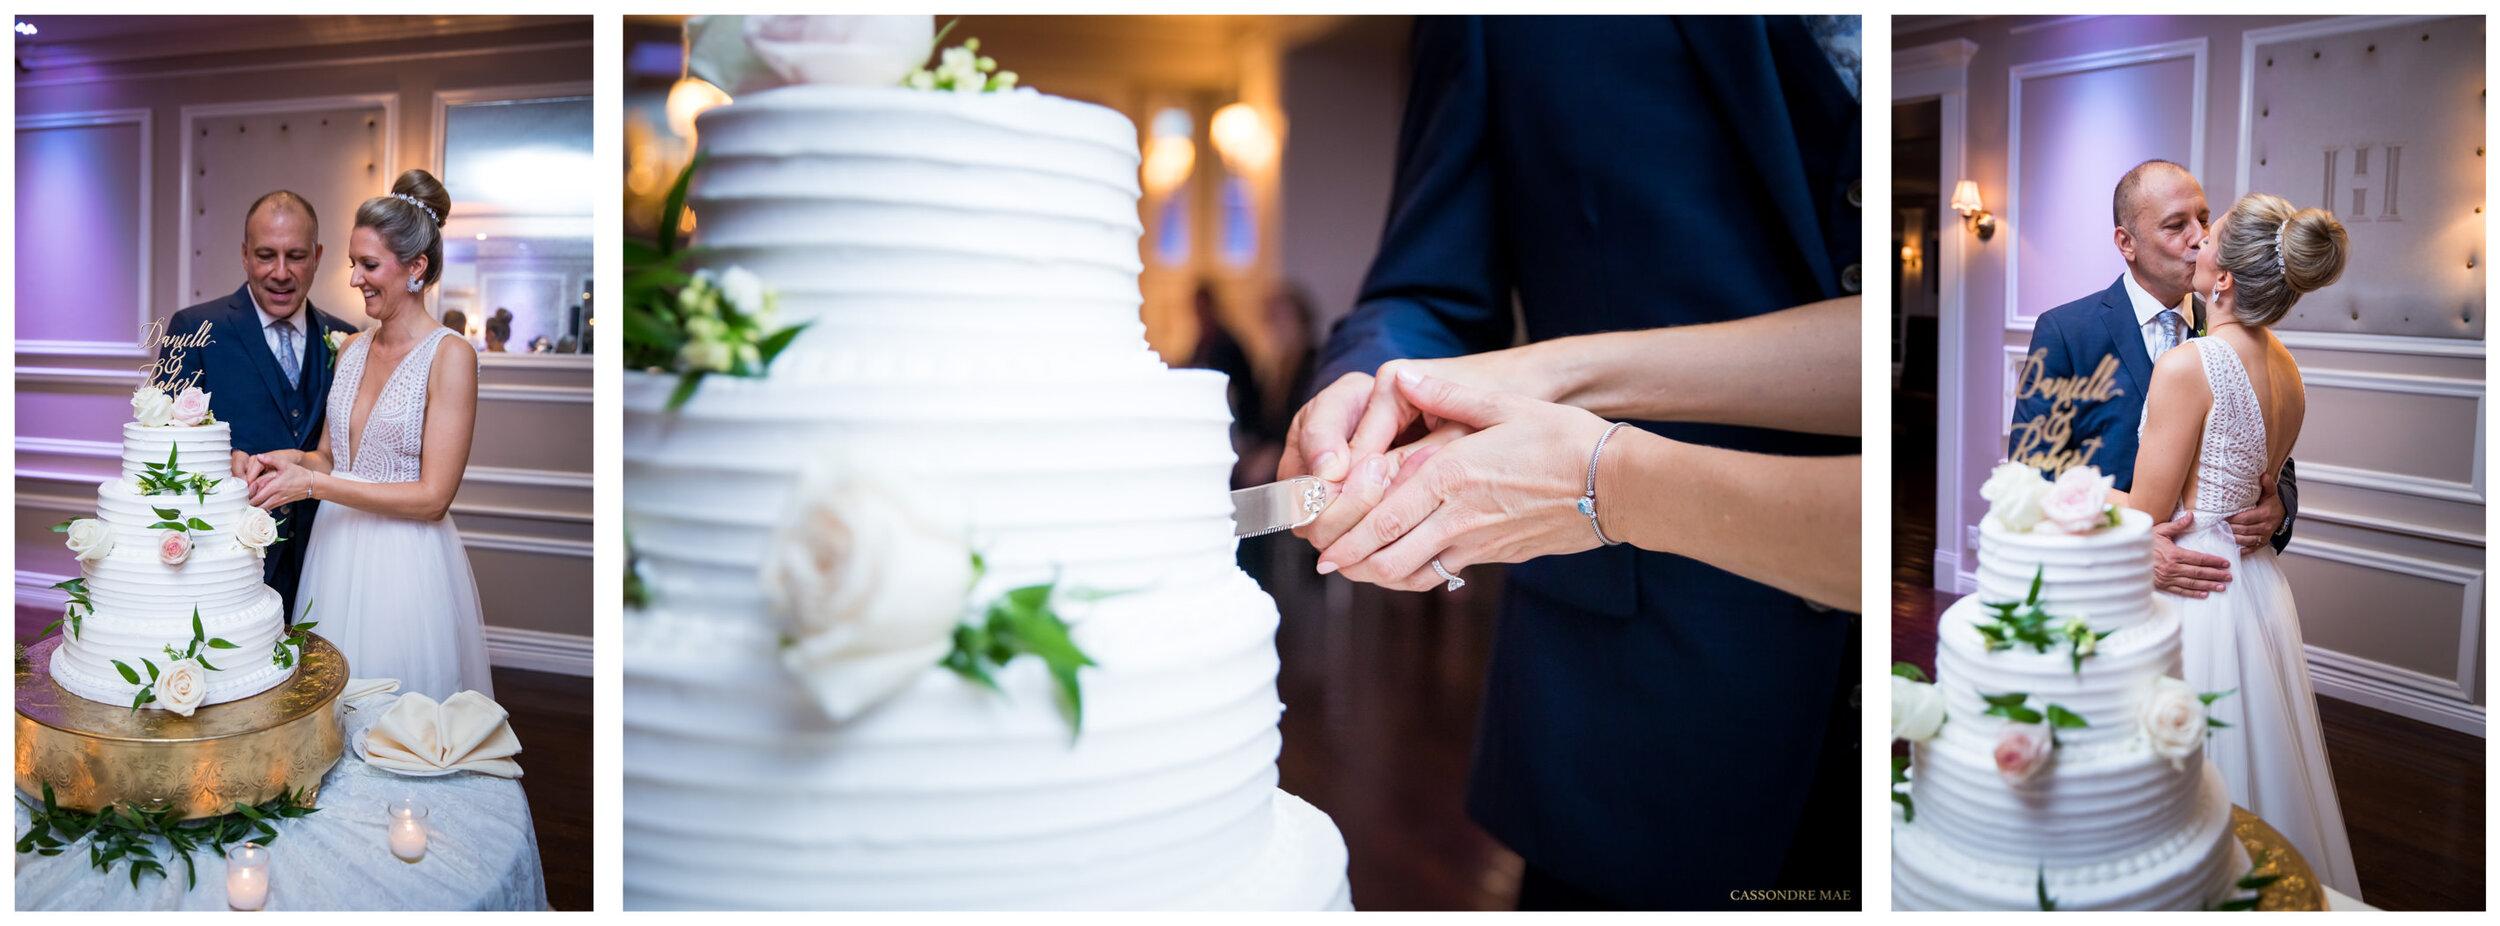 Cassondre Mae Photography Briarcliff Manor Wedding Photographer 19.jpg